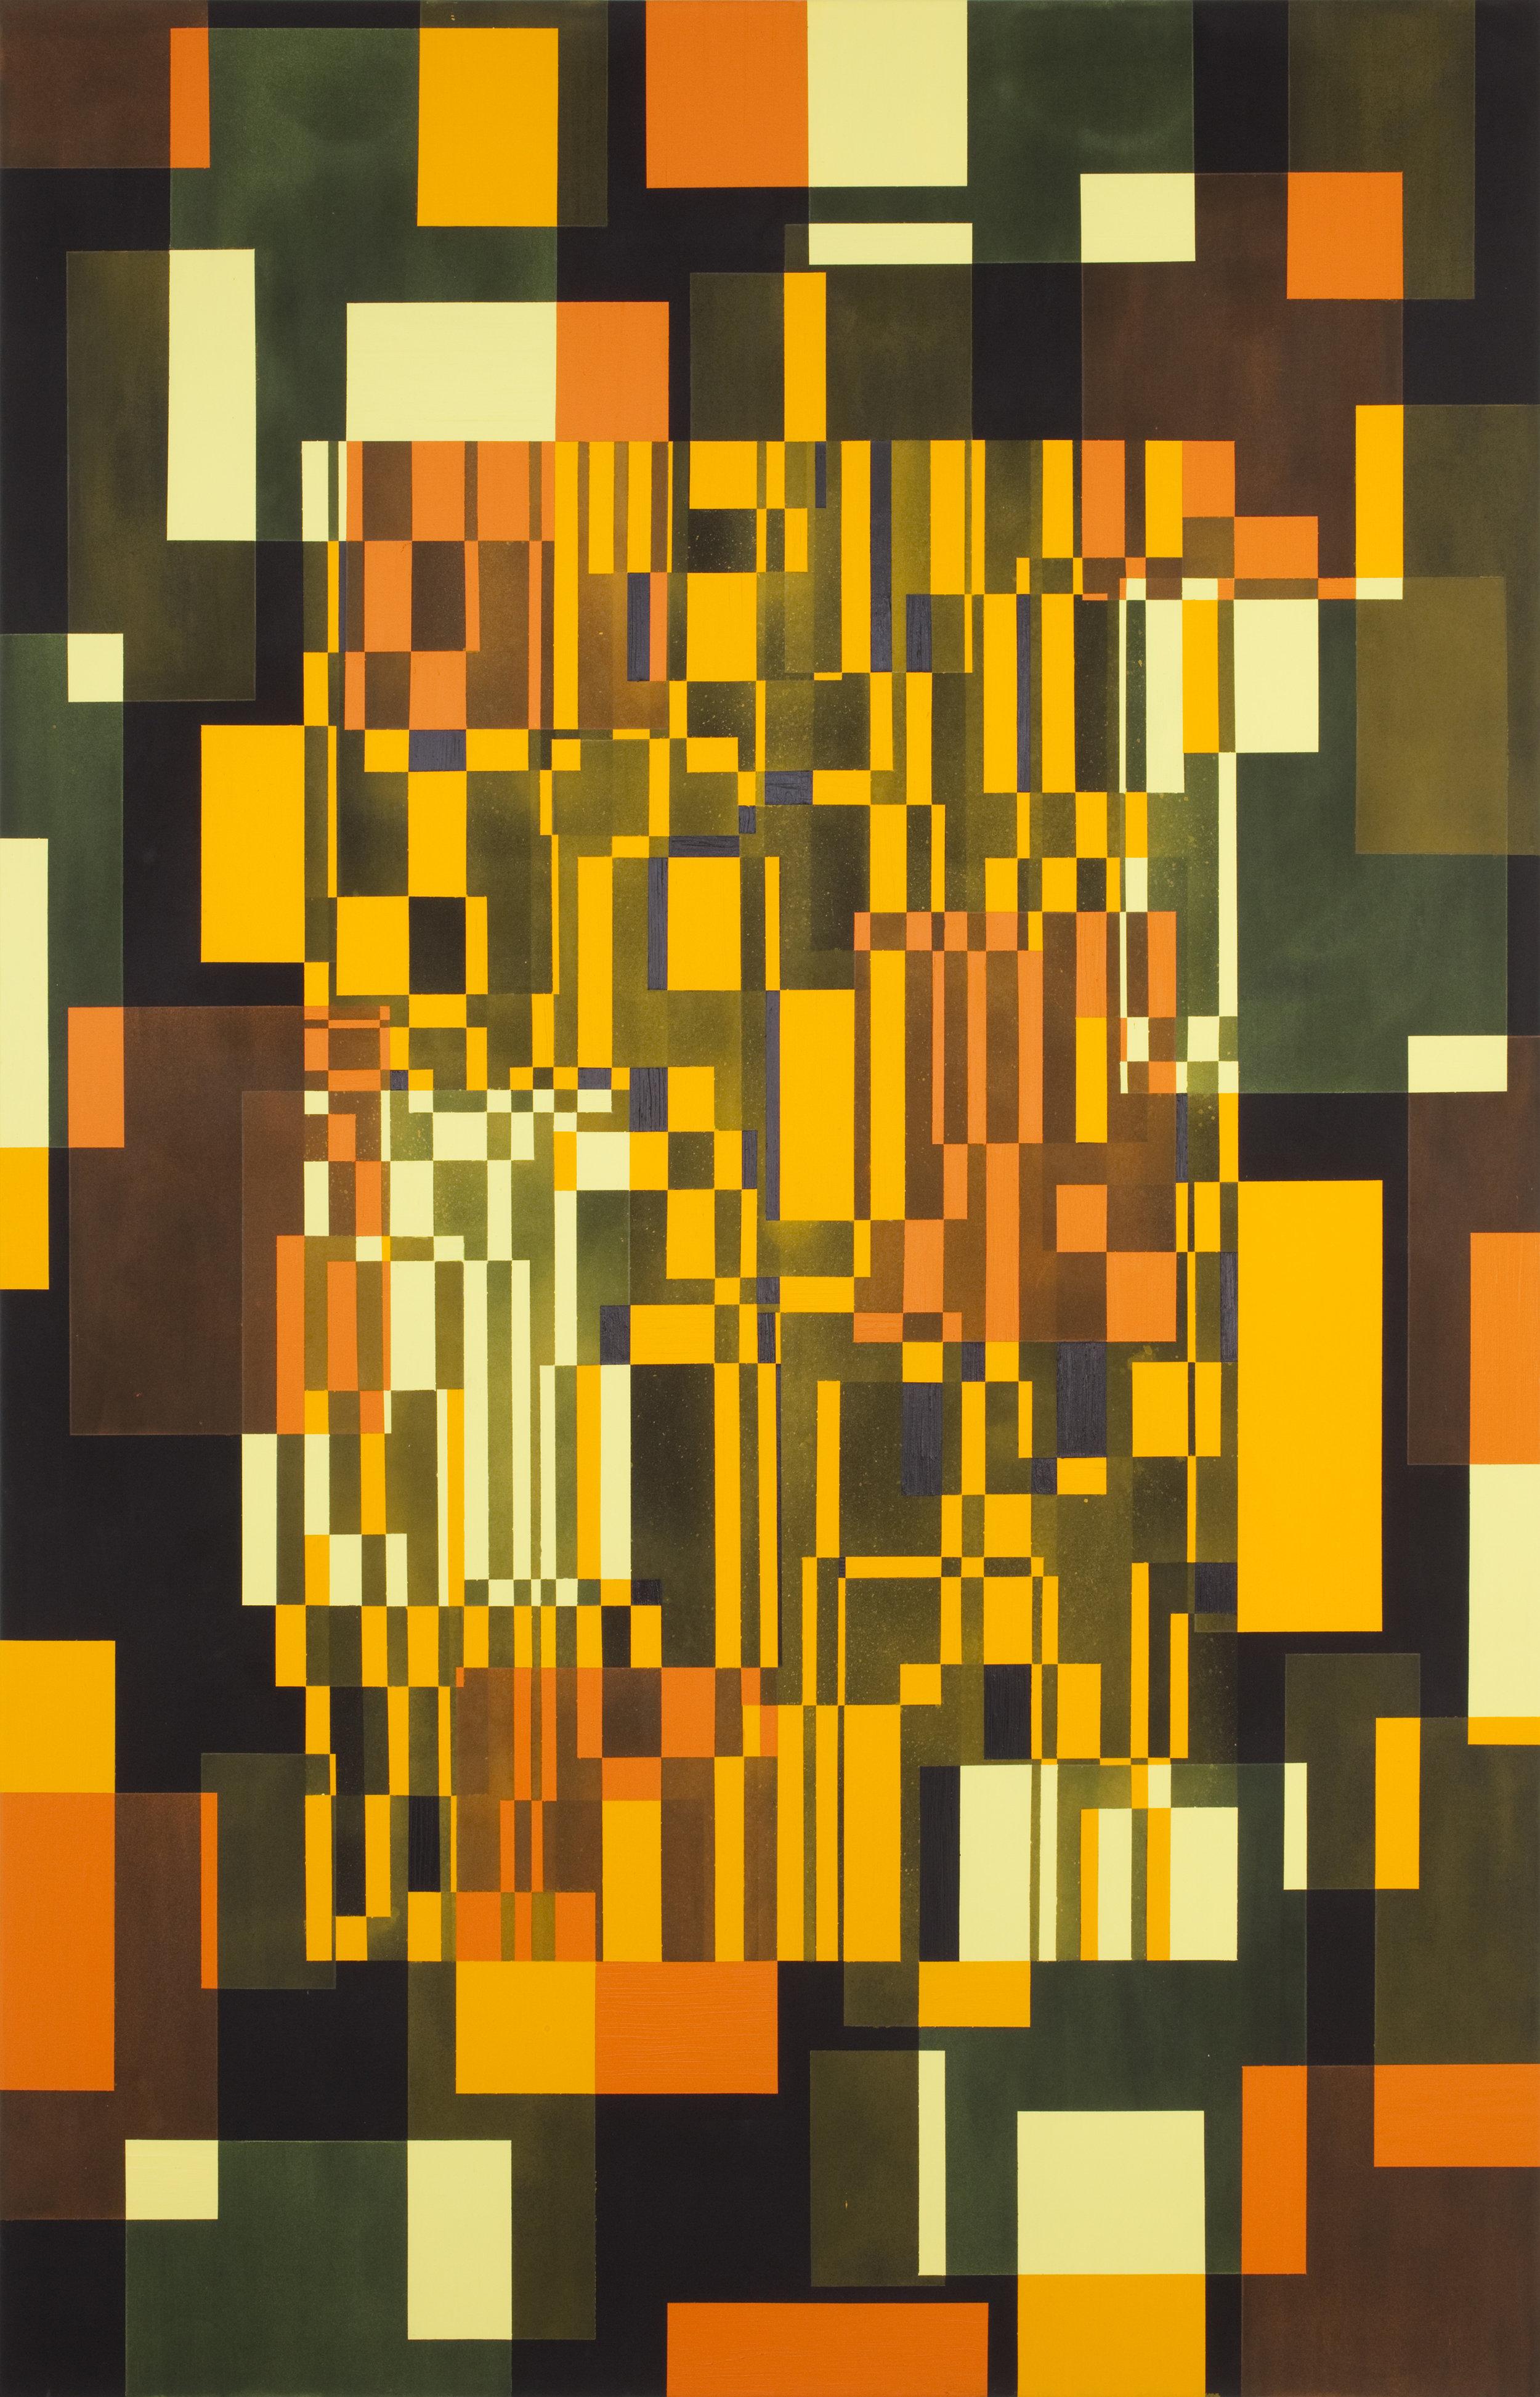 - 7. Marianne Therese Grønnow. Light. Dusk. Darkness, 2012. Acrylic on canvas. 240 x 140 cm.